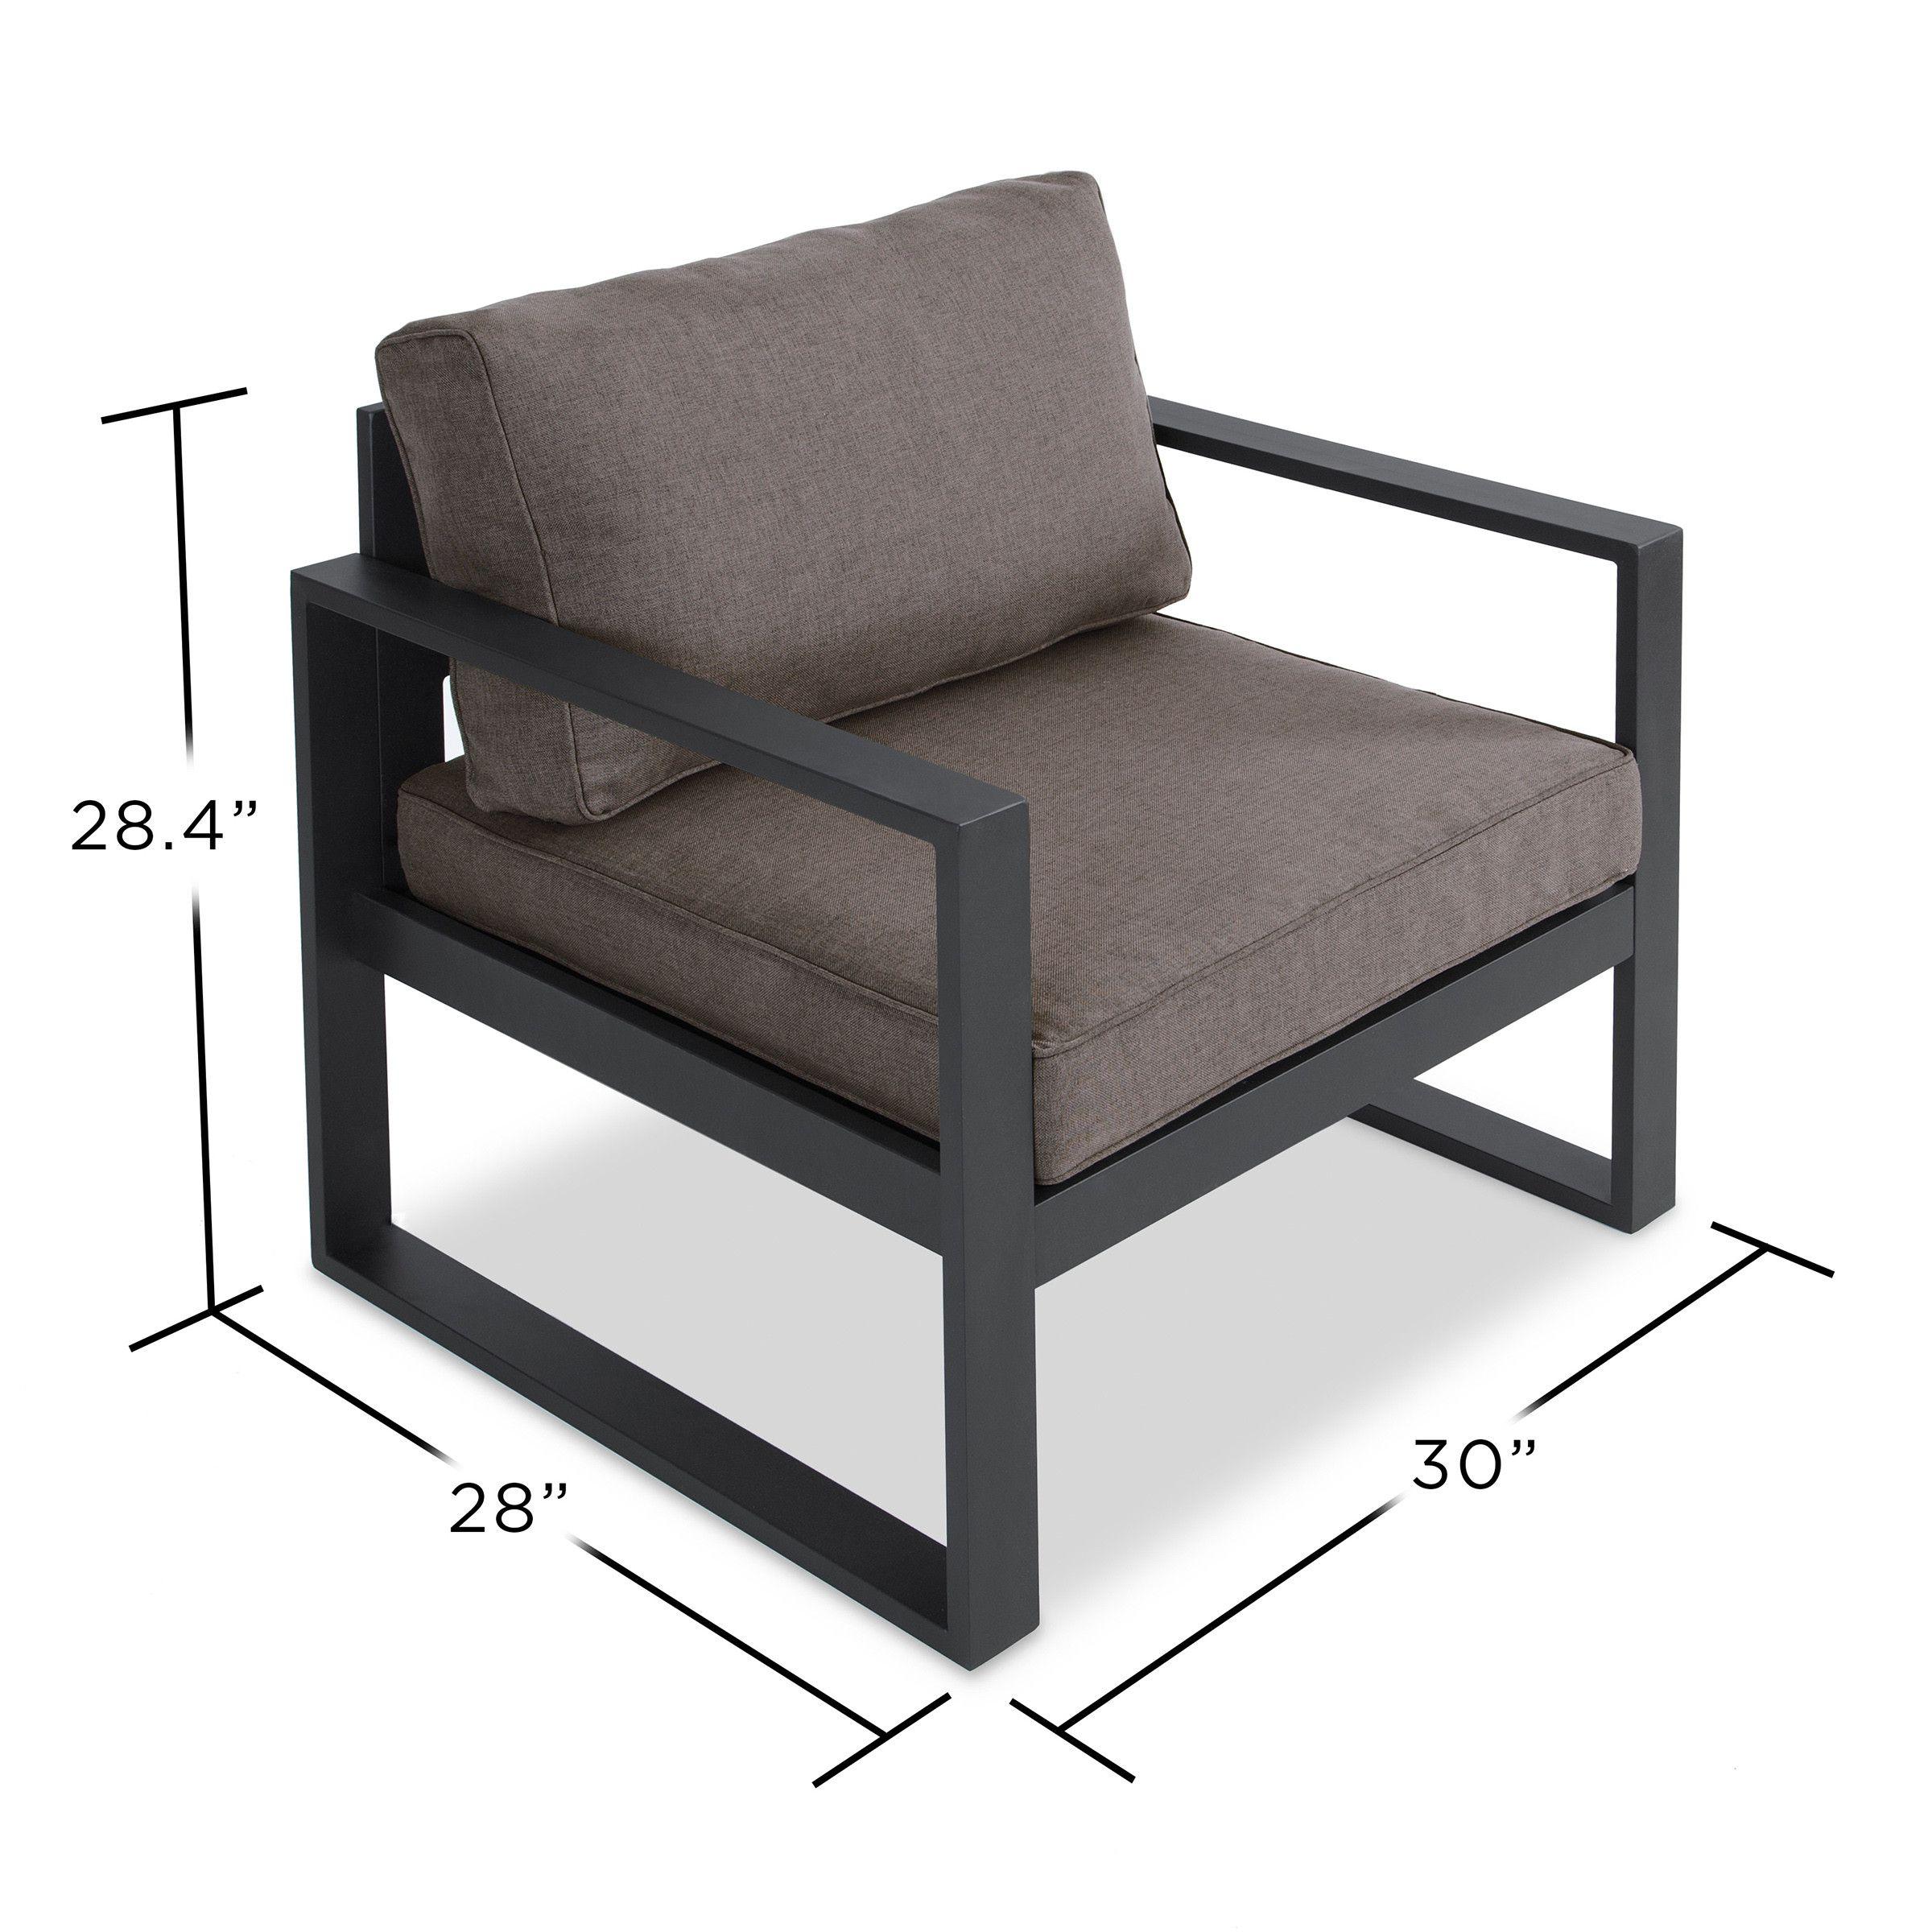 Baltic Patio Chair with Cushion in 2018 | PORTAS ...